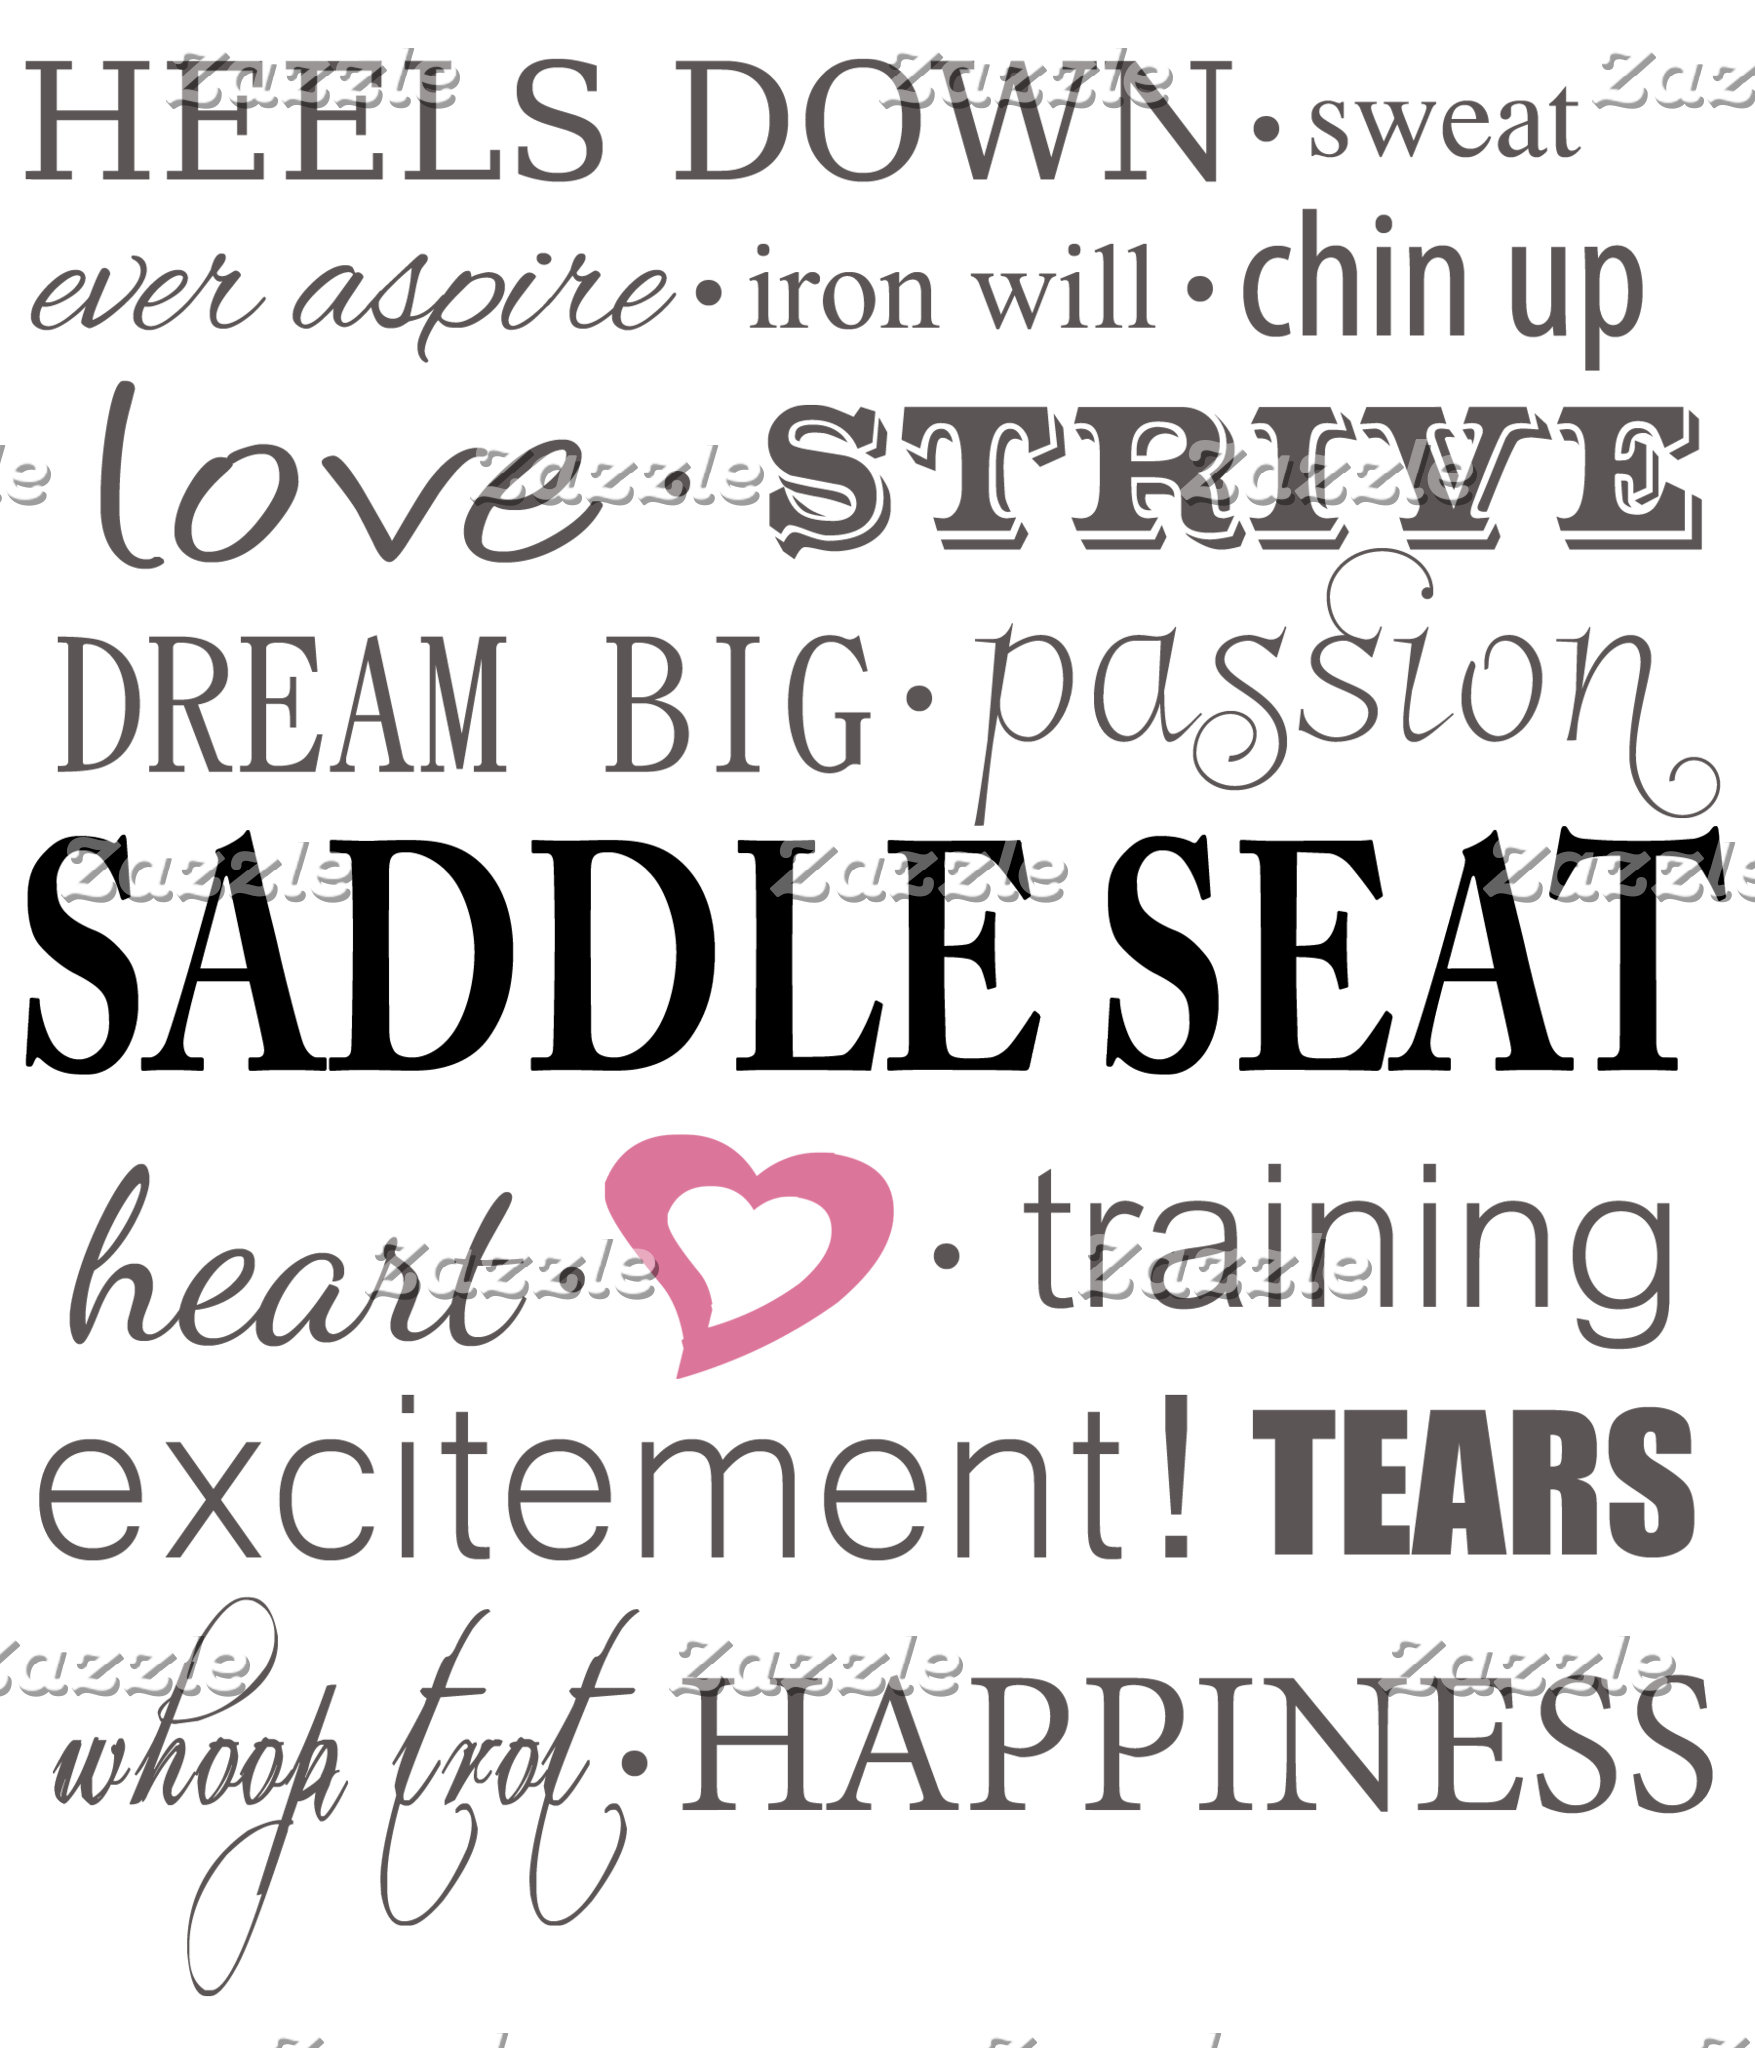 Aspects of Saddle Seat